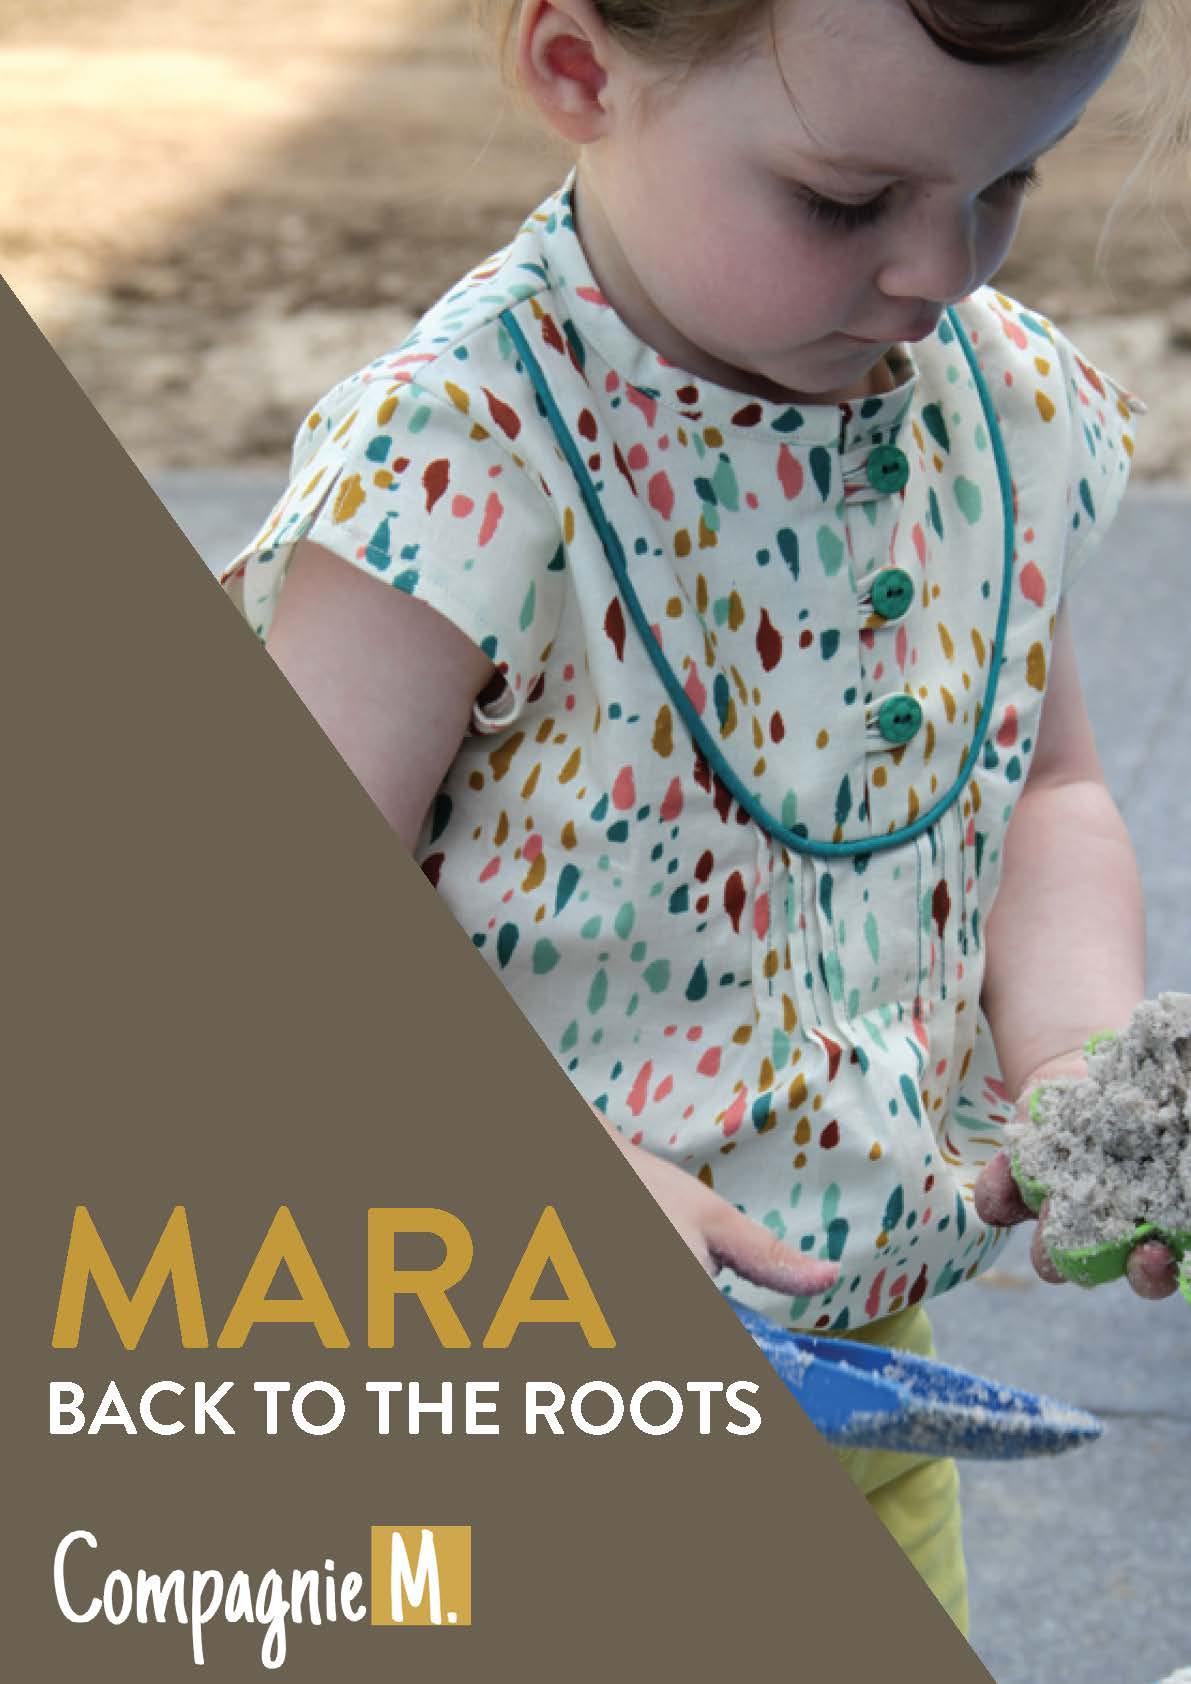 The Mara look-book